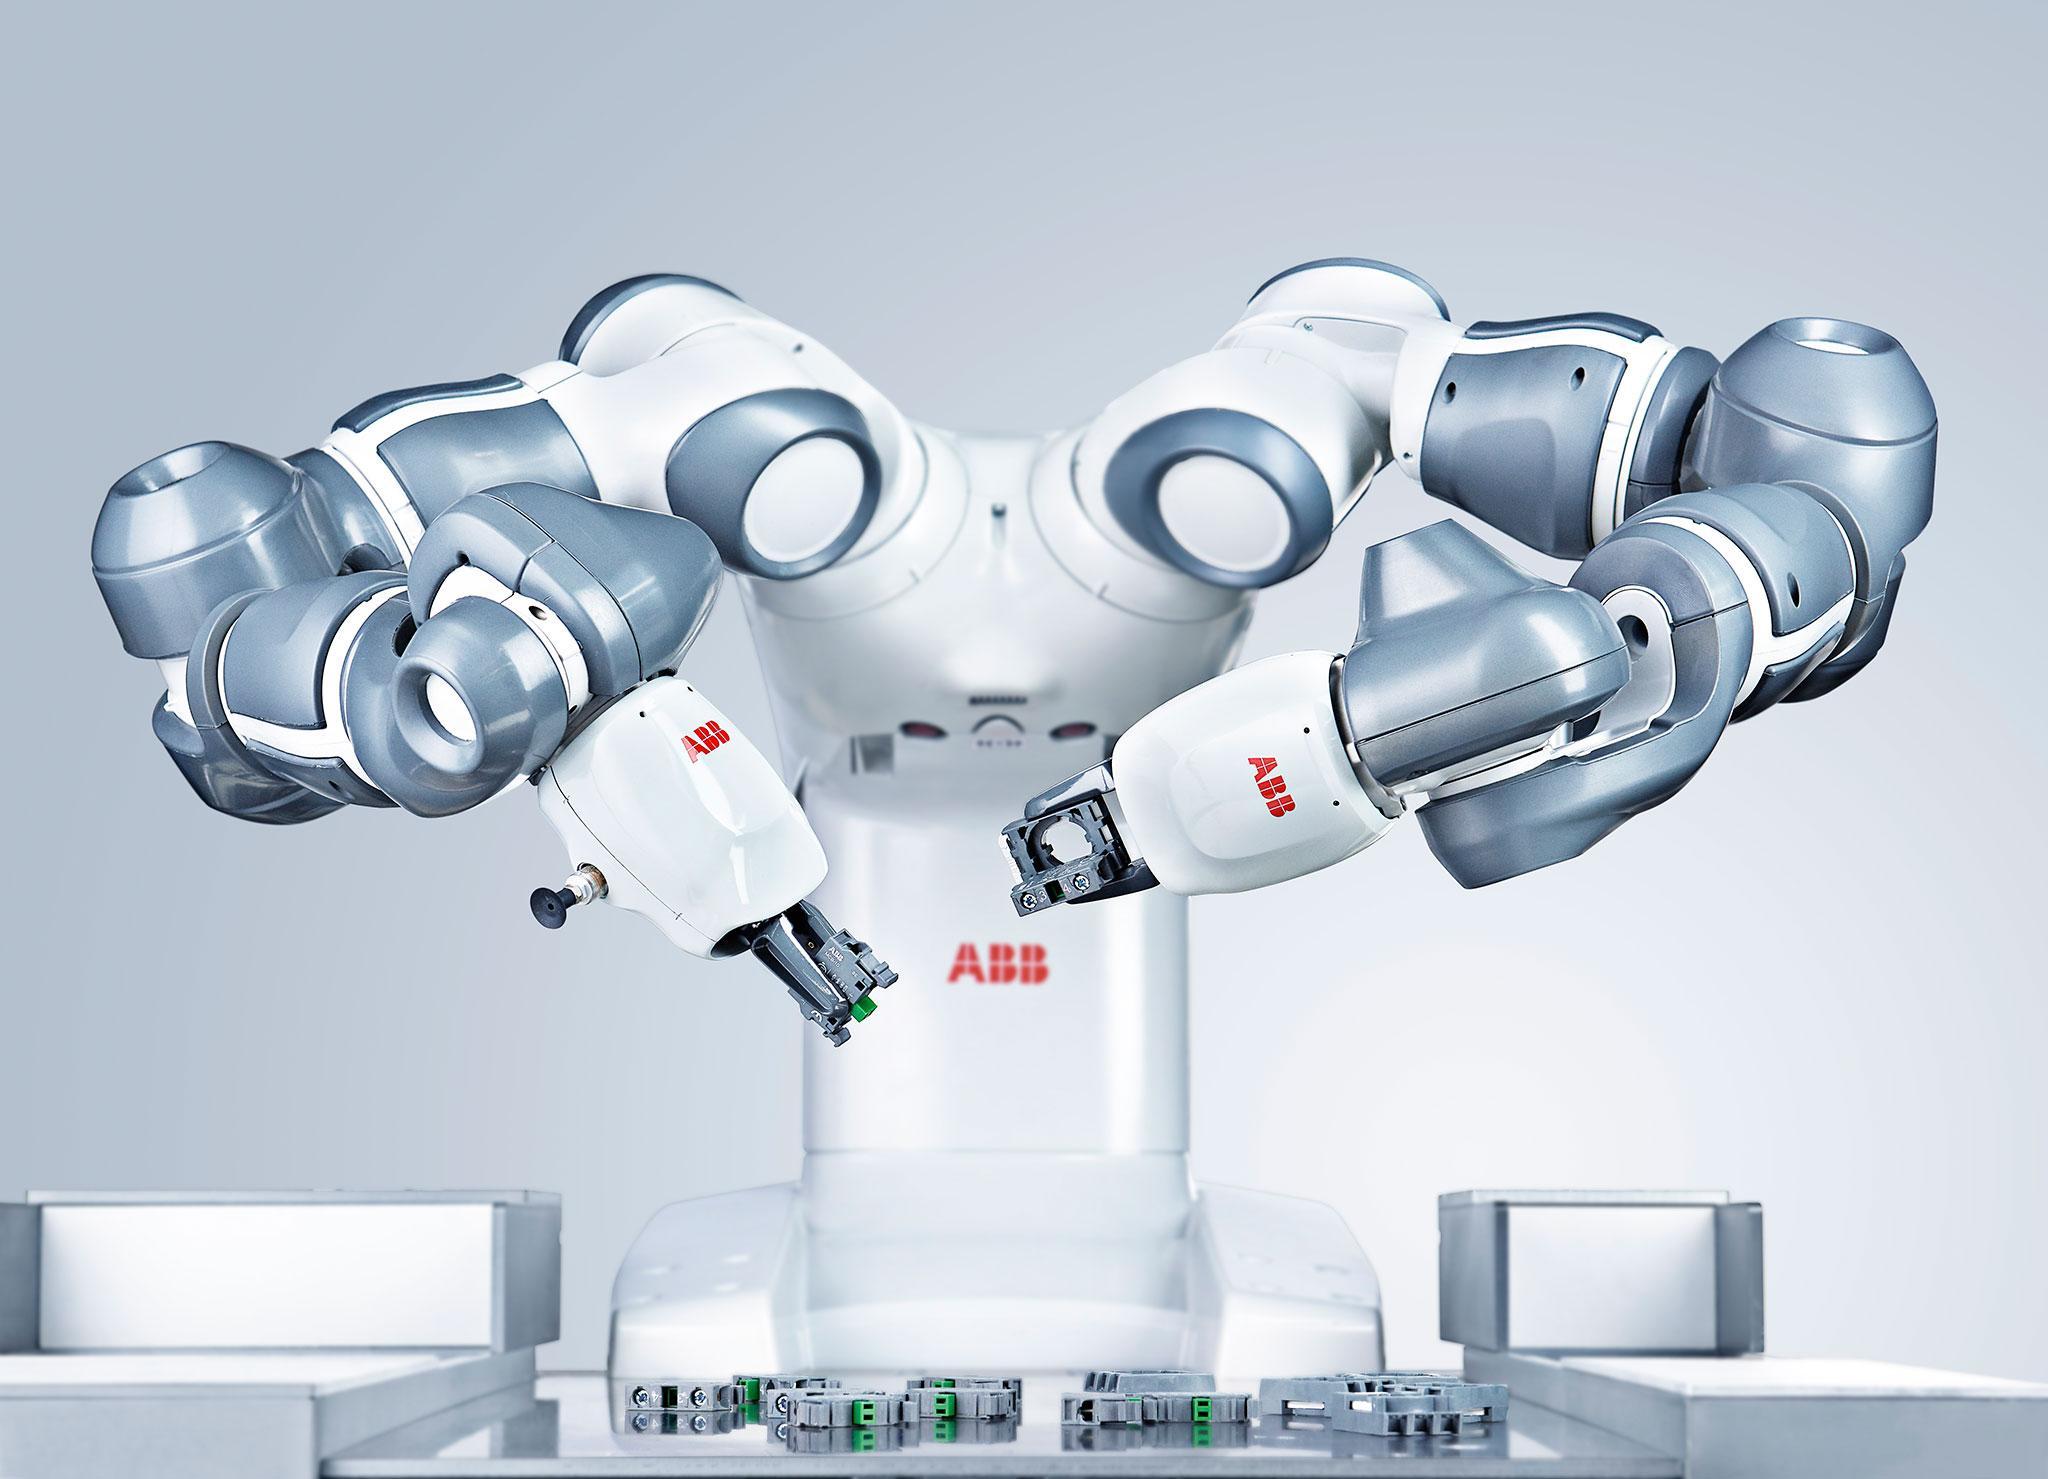 abb-yumi-collaborative-robot